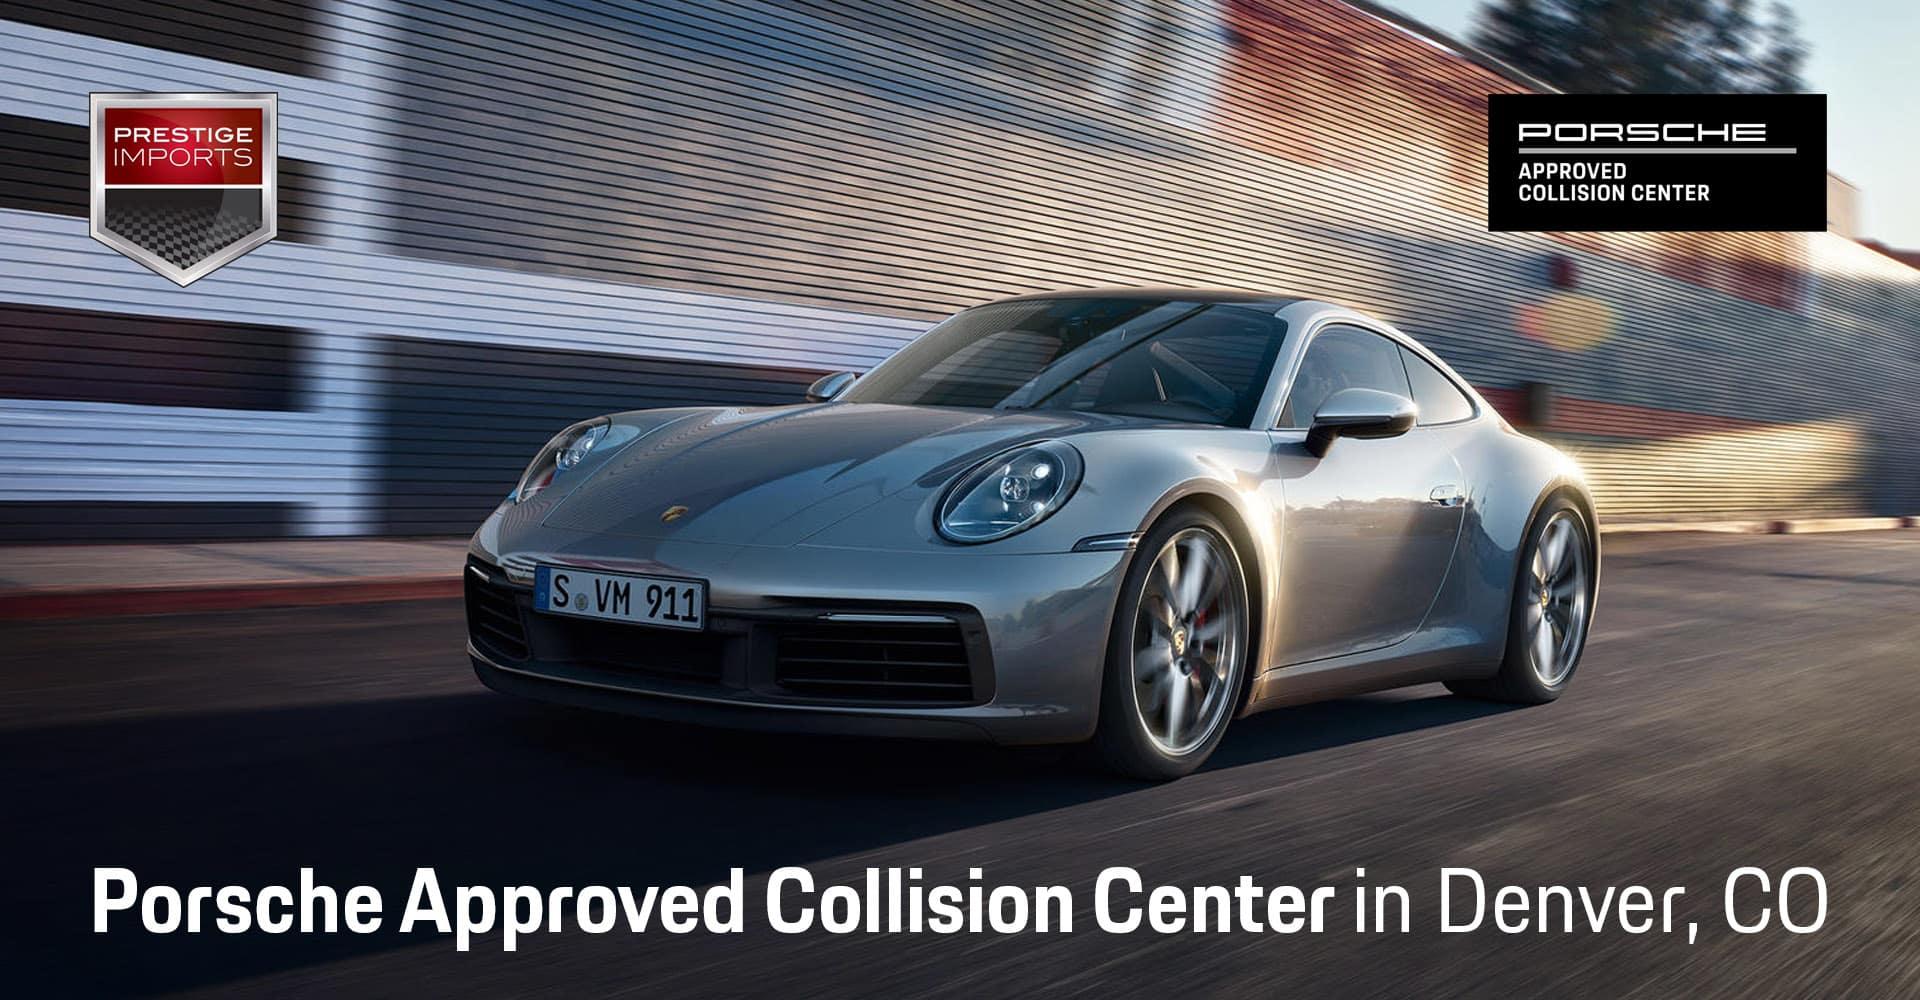 Approved Porsche Body Shop in Denver, CO